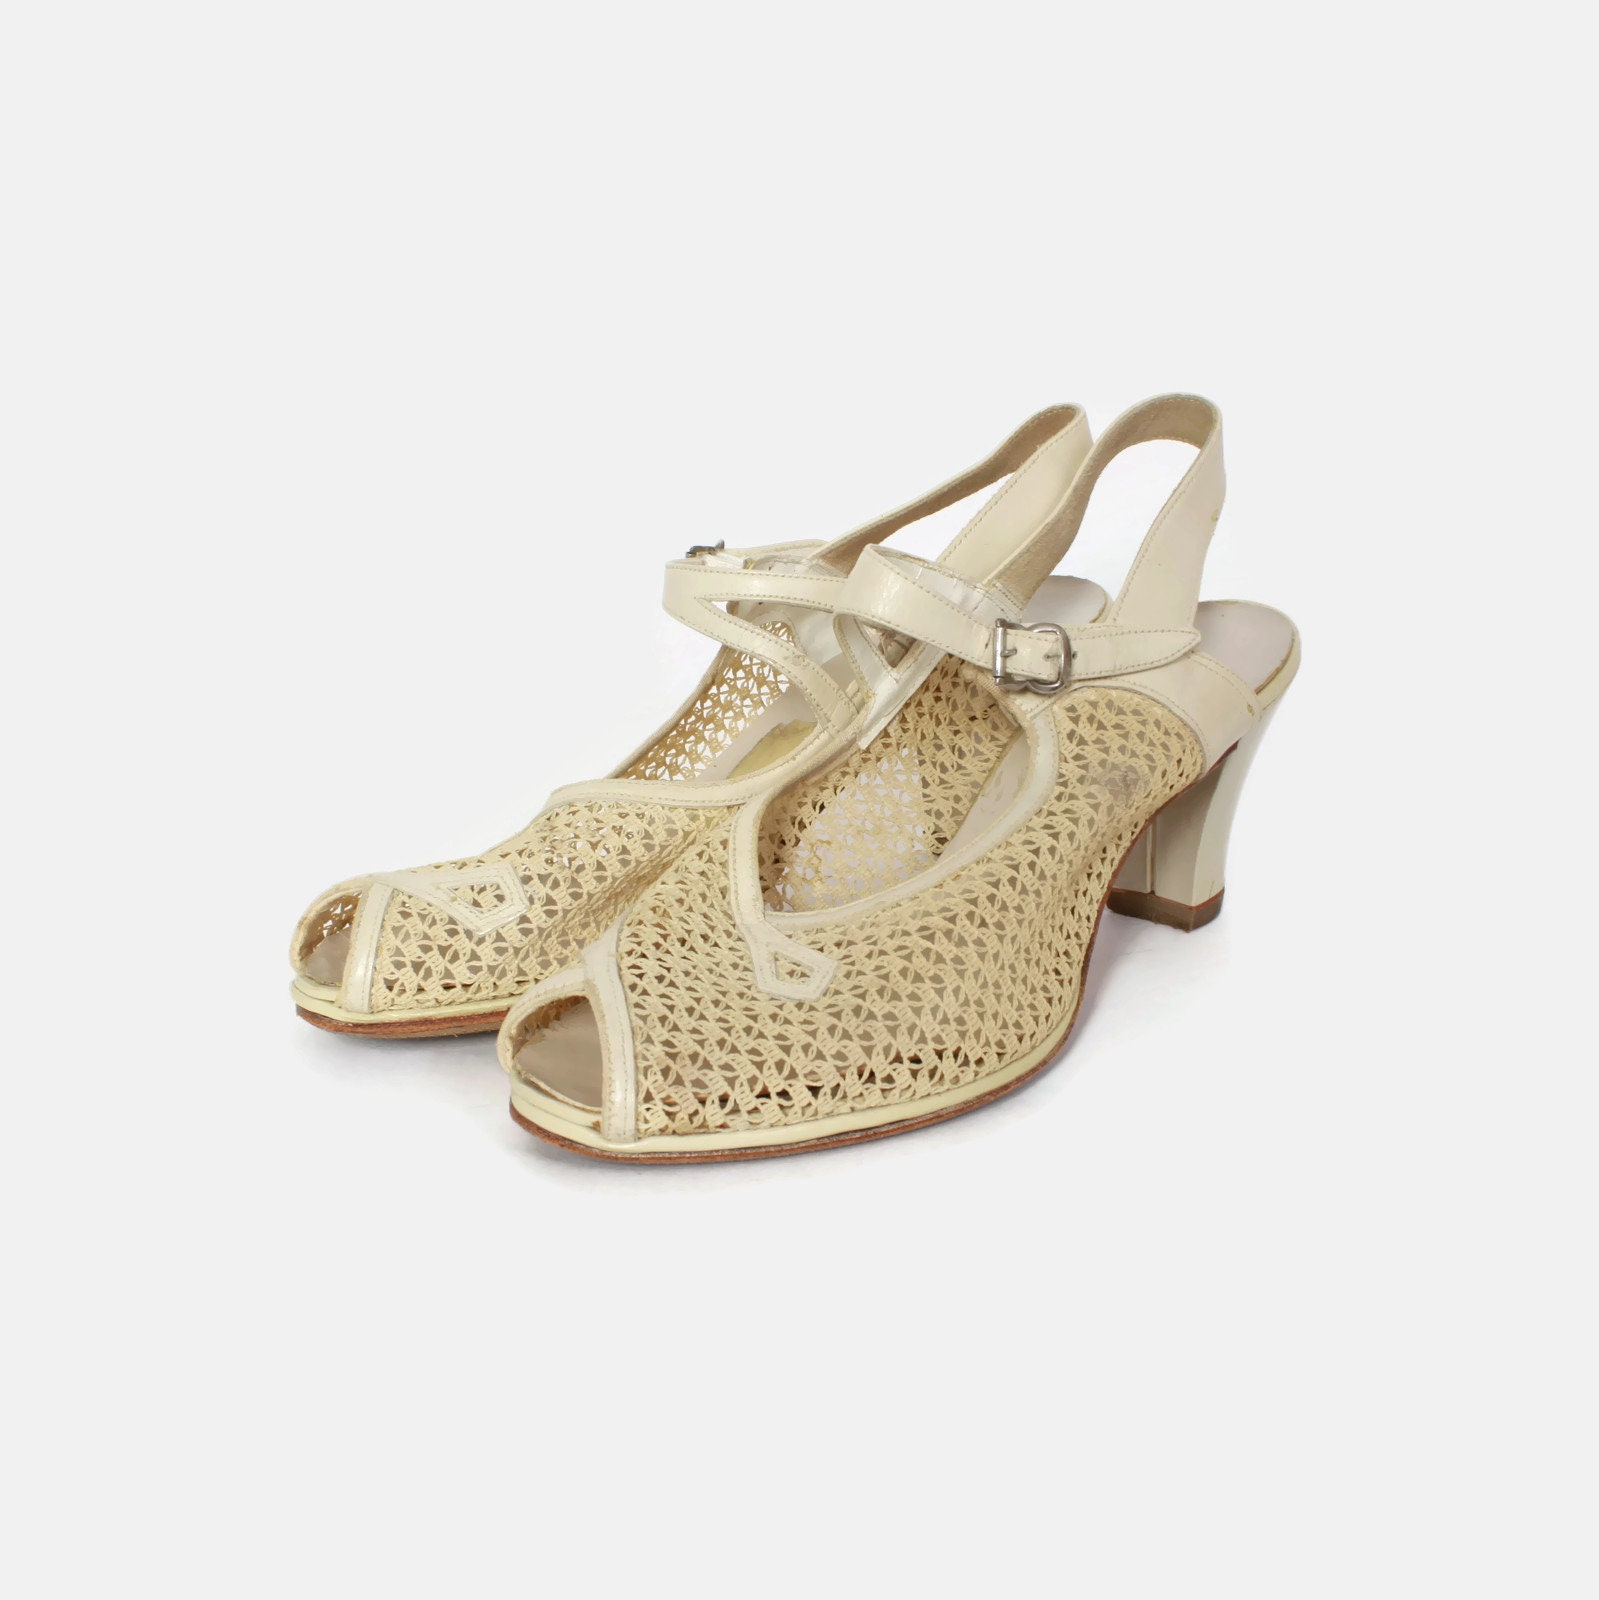 6a88e39a07941 Vintage Ivory Mesh HEELS   1940s Cream Leather   Mesh Peep Toe